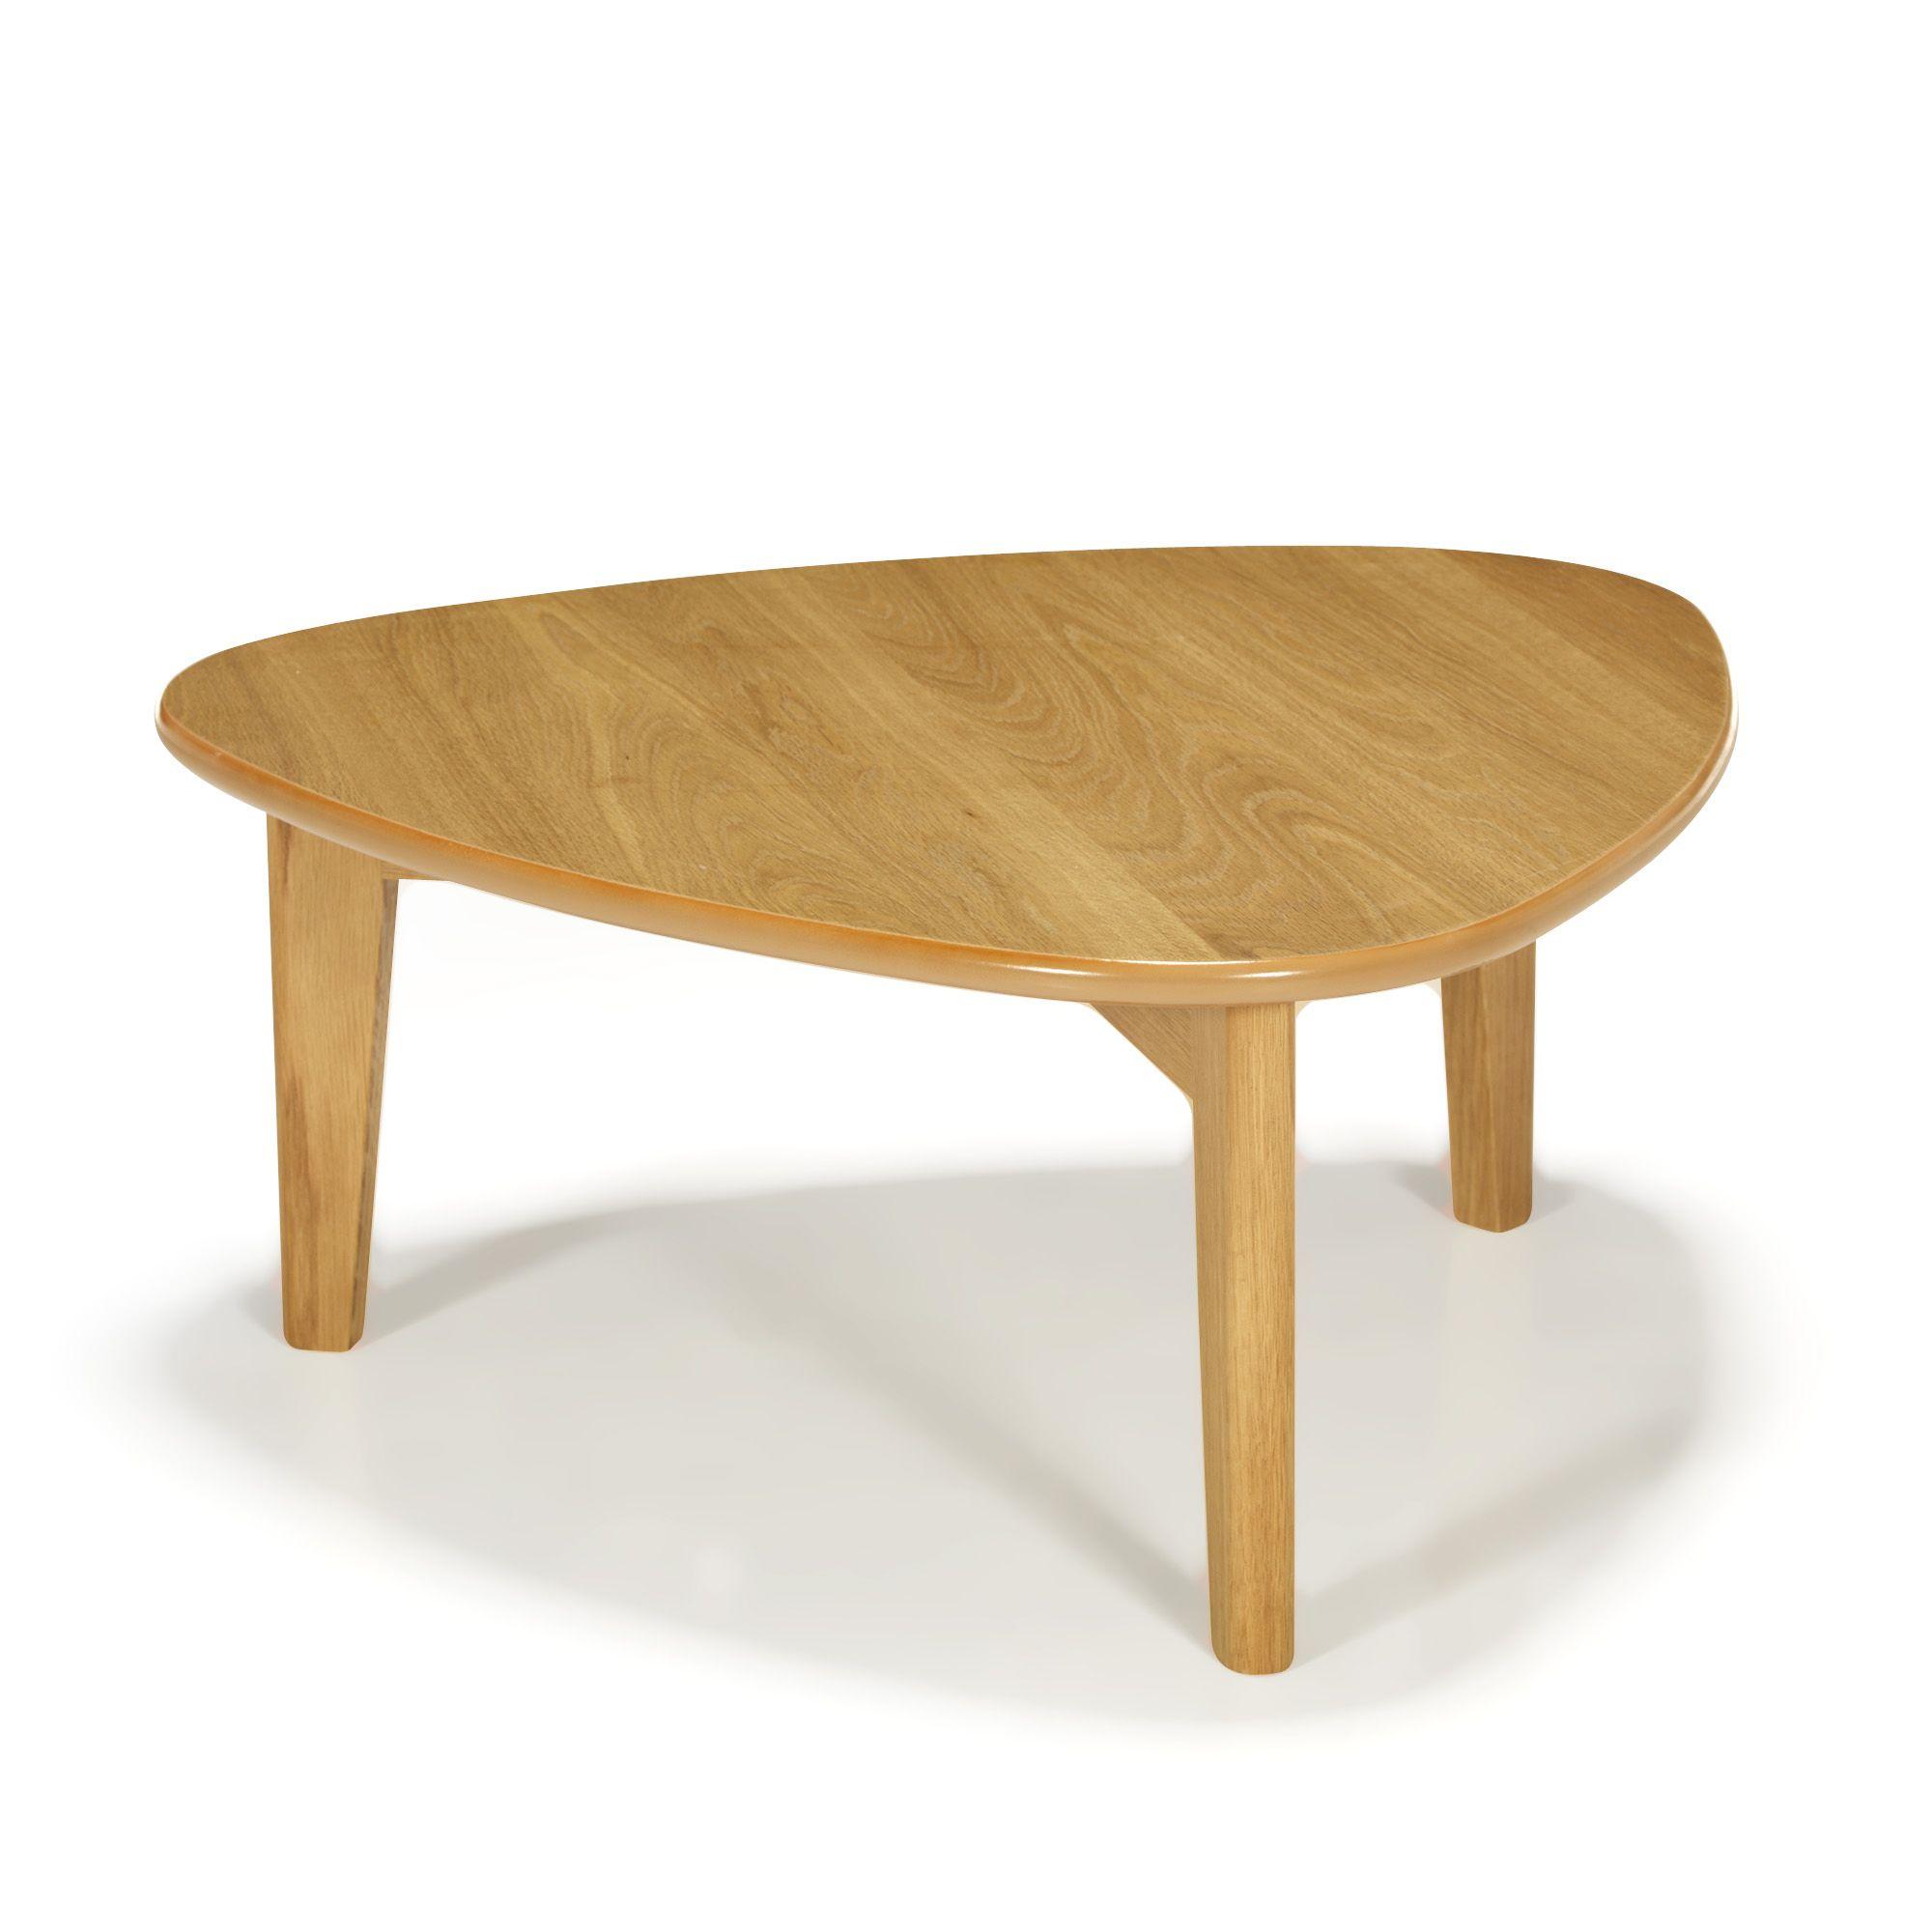 Faire table basse scandinave